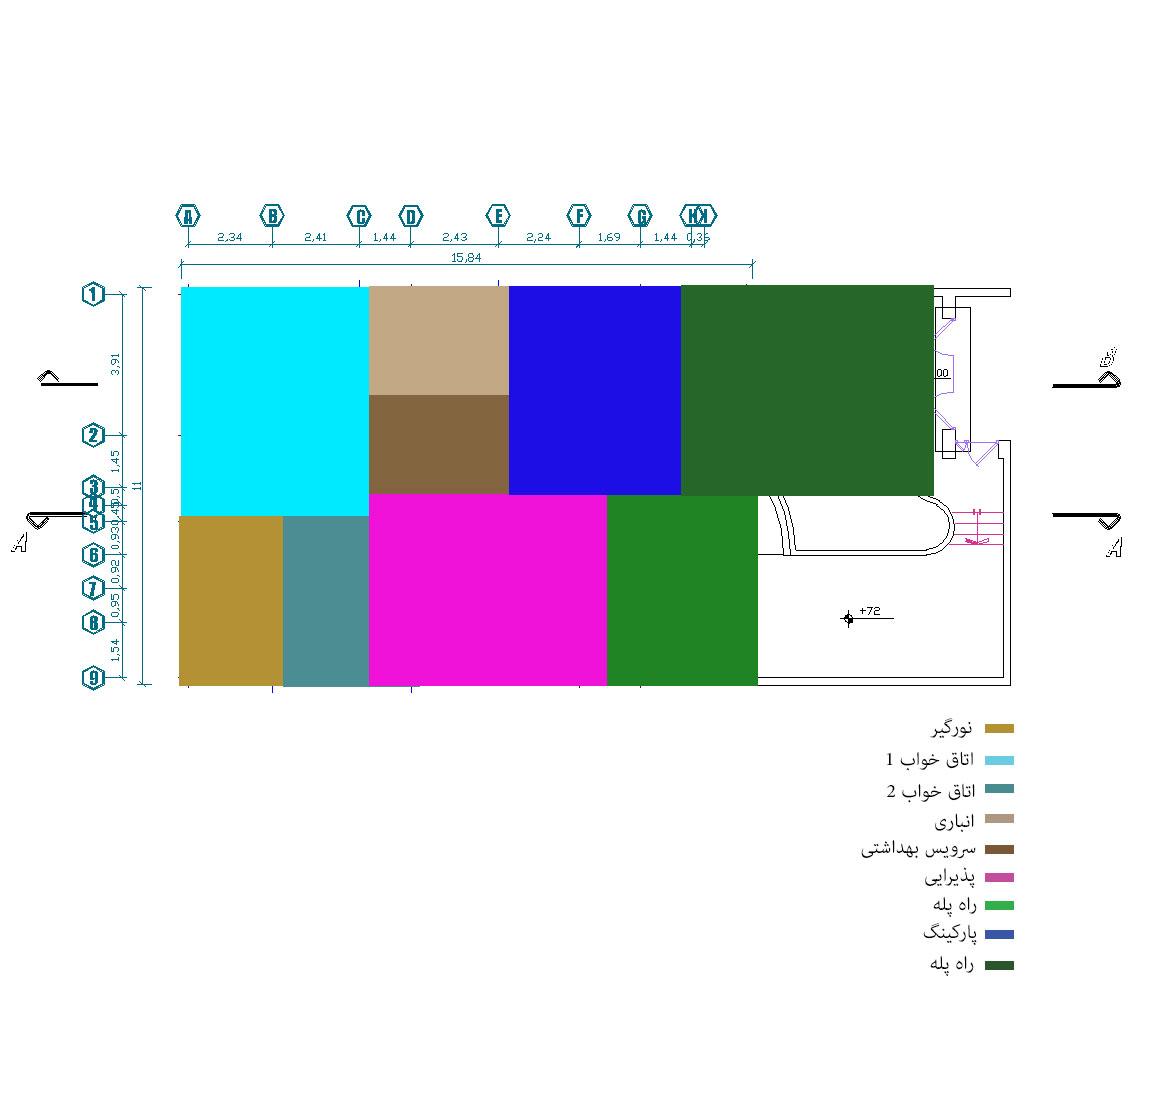 سایت پلان نقشه ساختمان ویلای دوبلکس